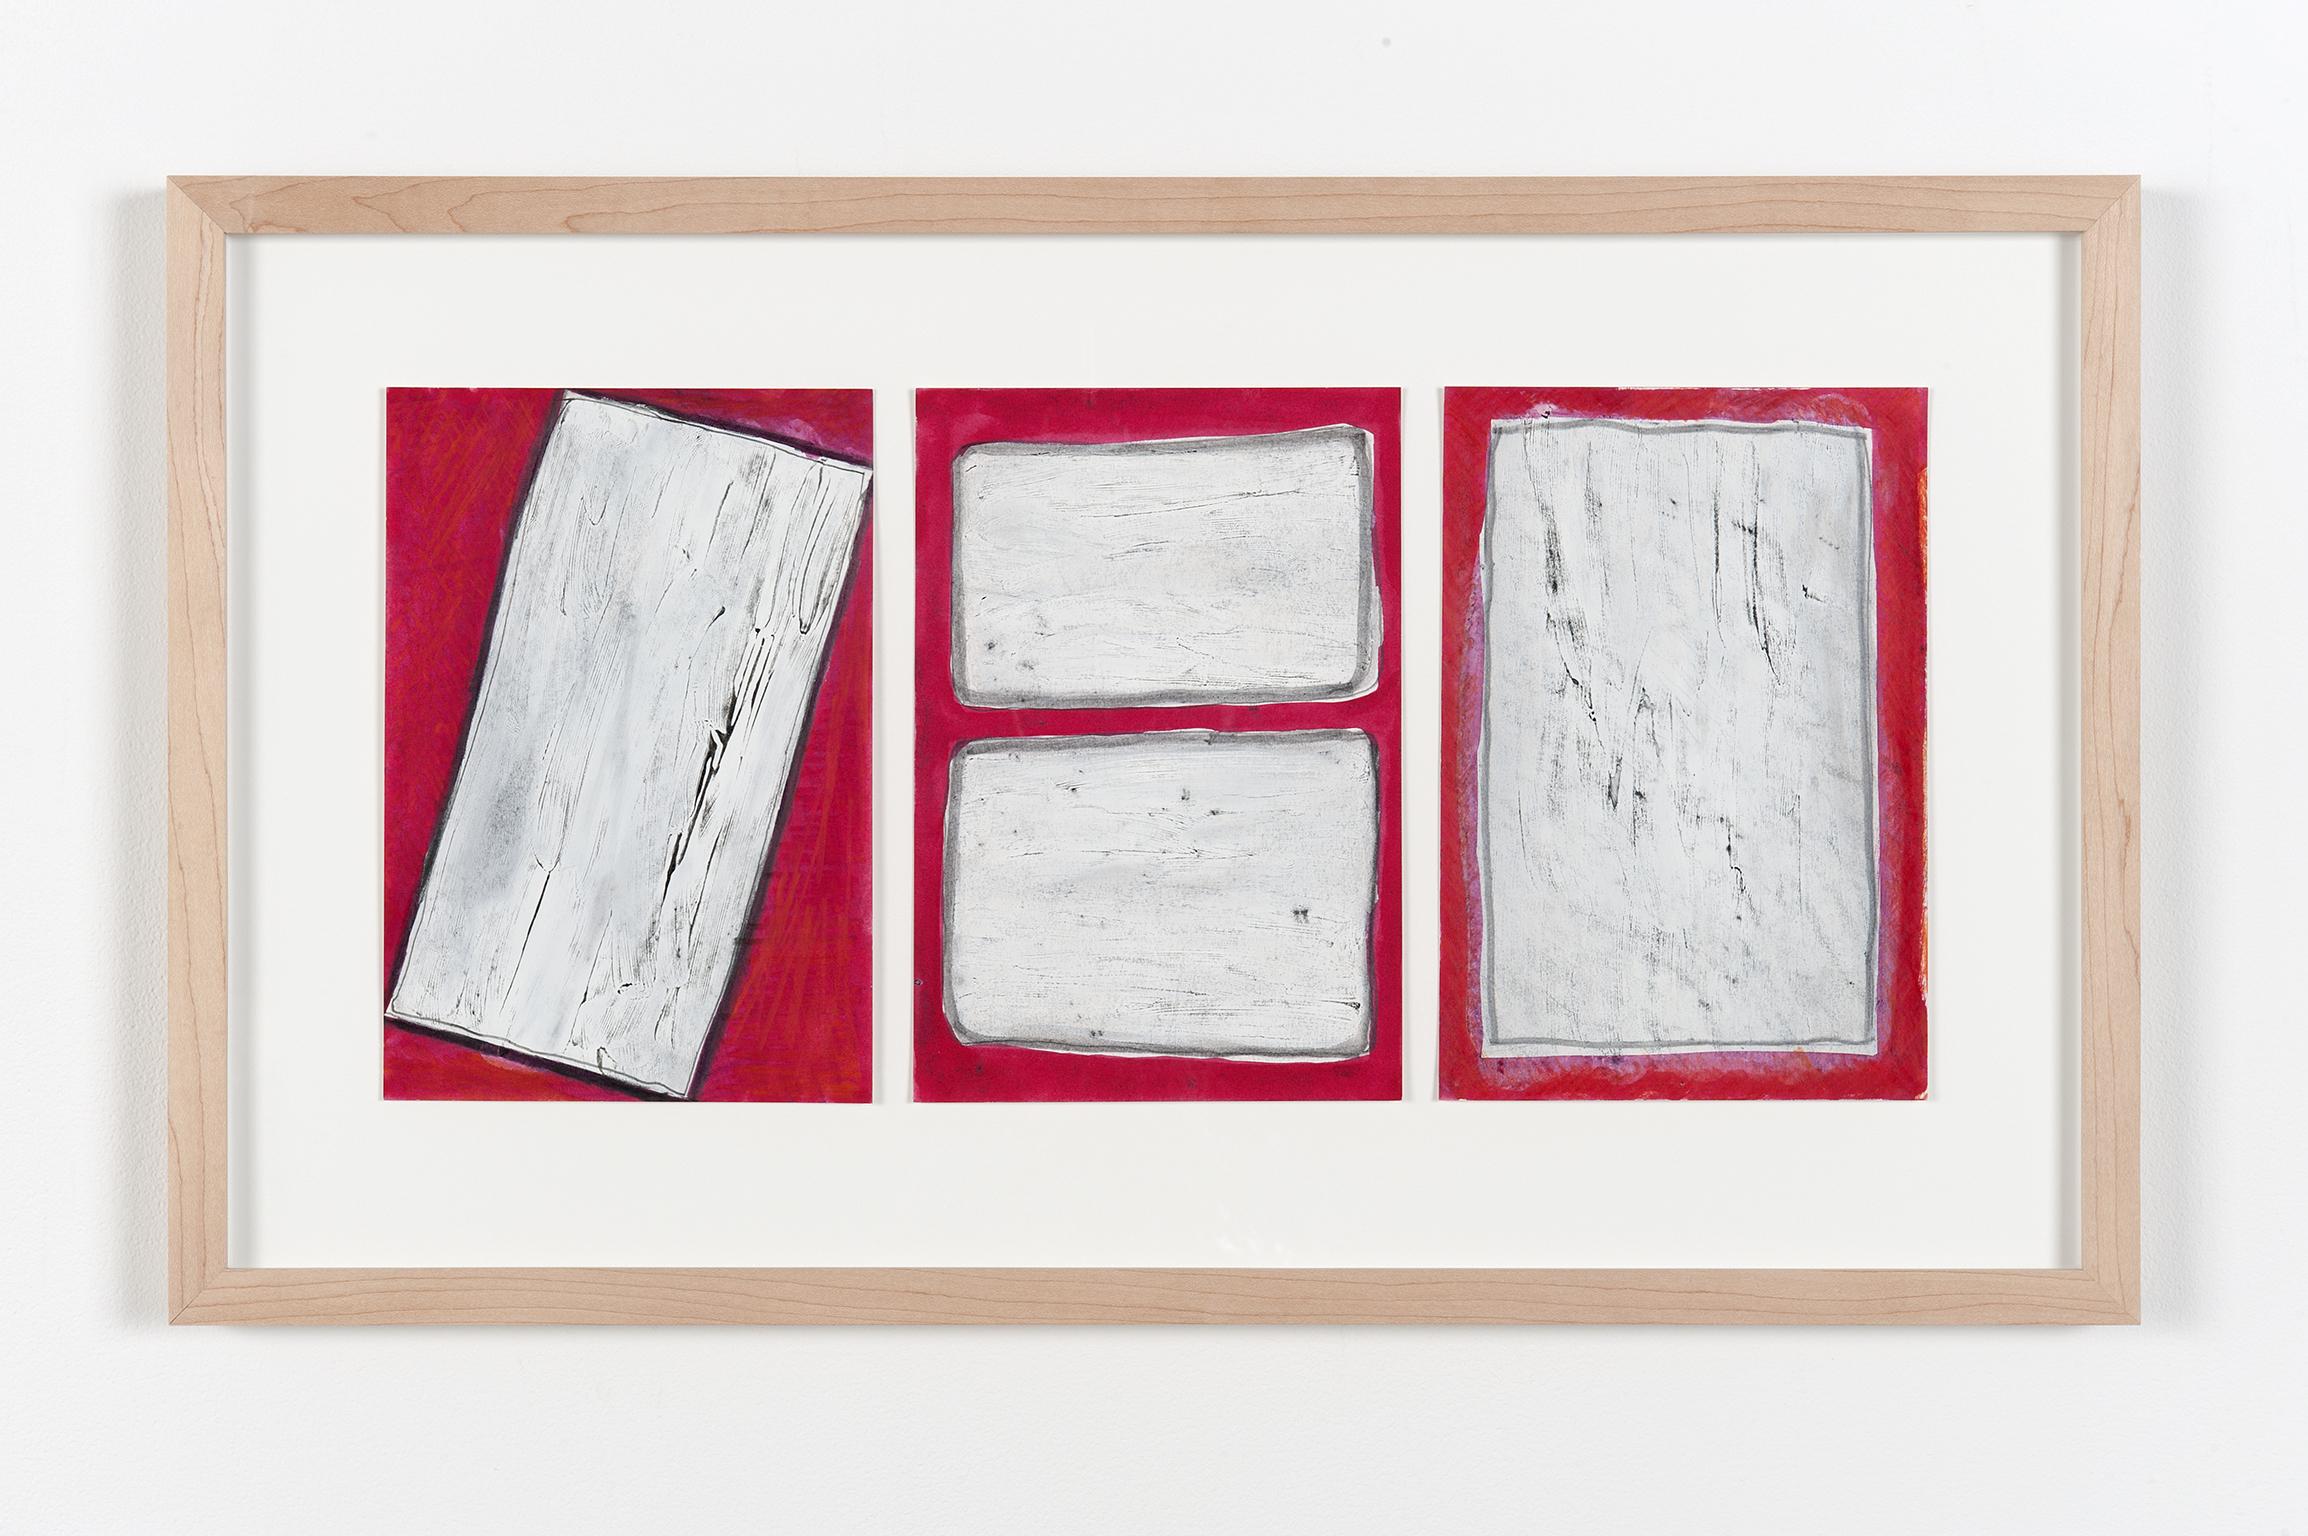 Robert Kleyn, Fields, 1979, graphite and gouache on paper, 16 x 26 in. (39 x 57 cm) by